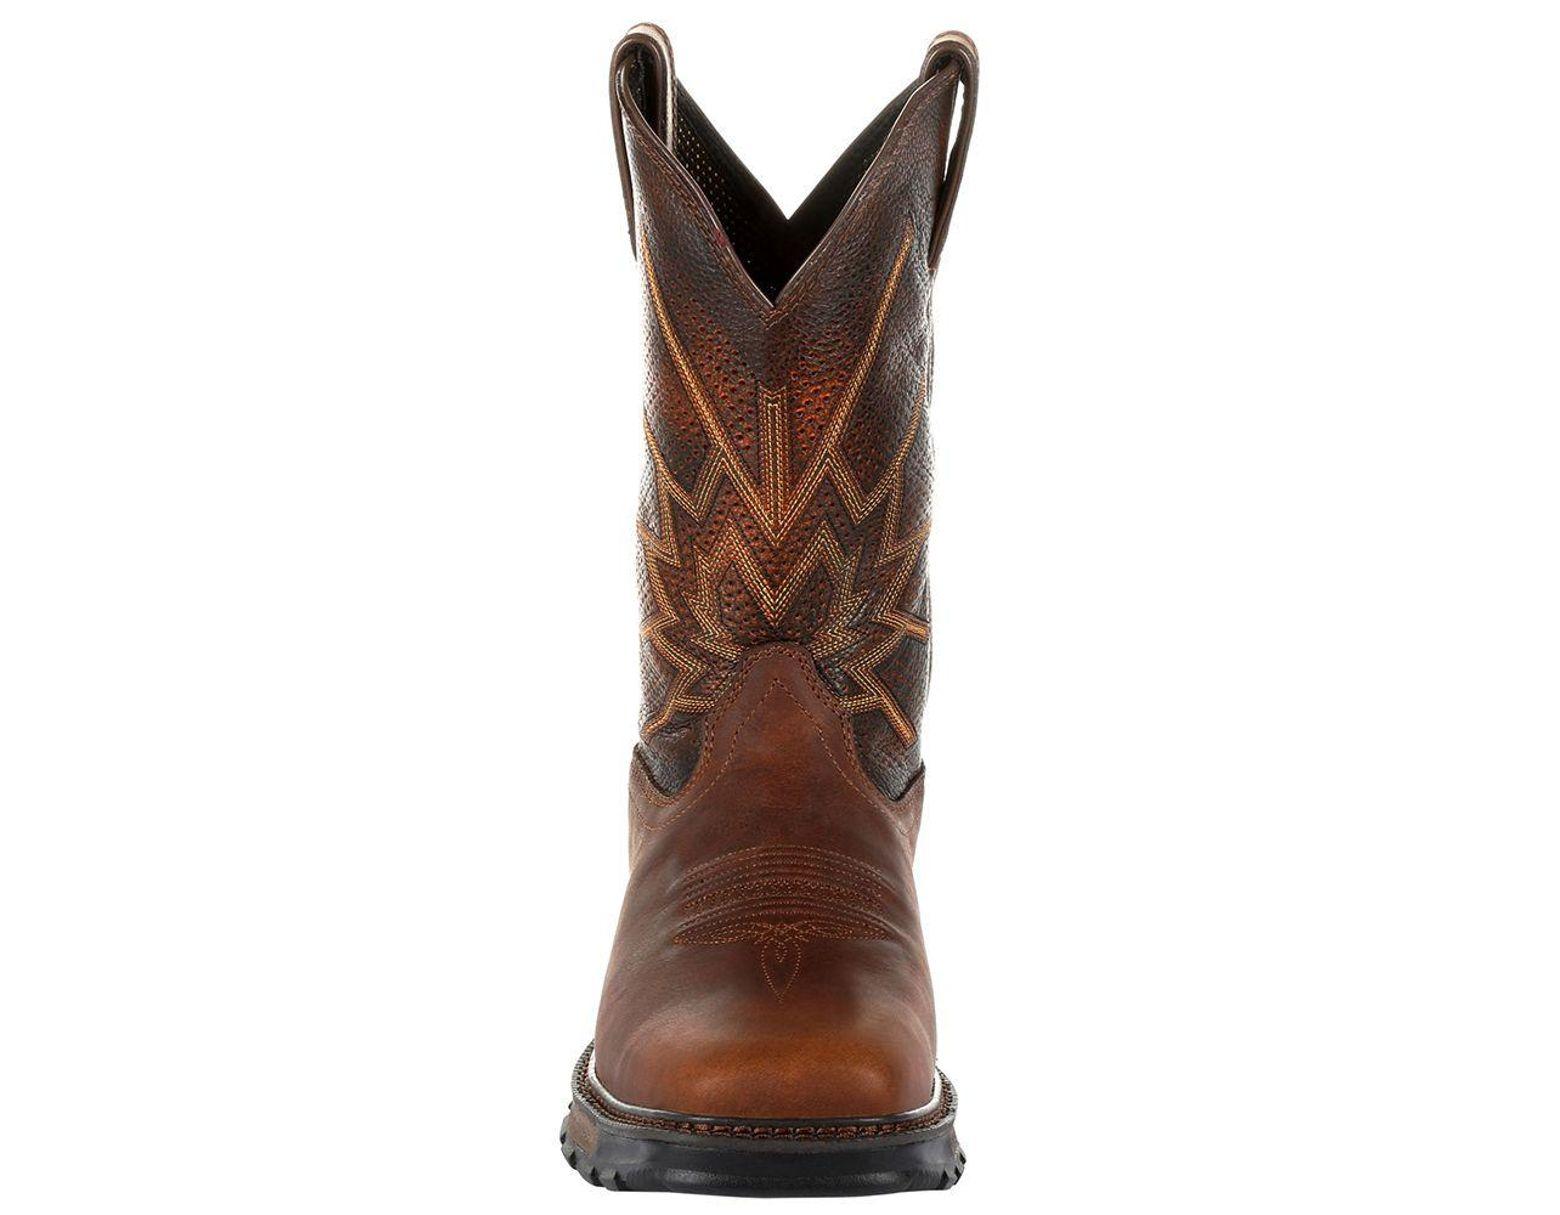 78de883a49d Durango Maverick Xp Ventilated Western Work Boot in Brown for Men - Lyst